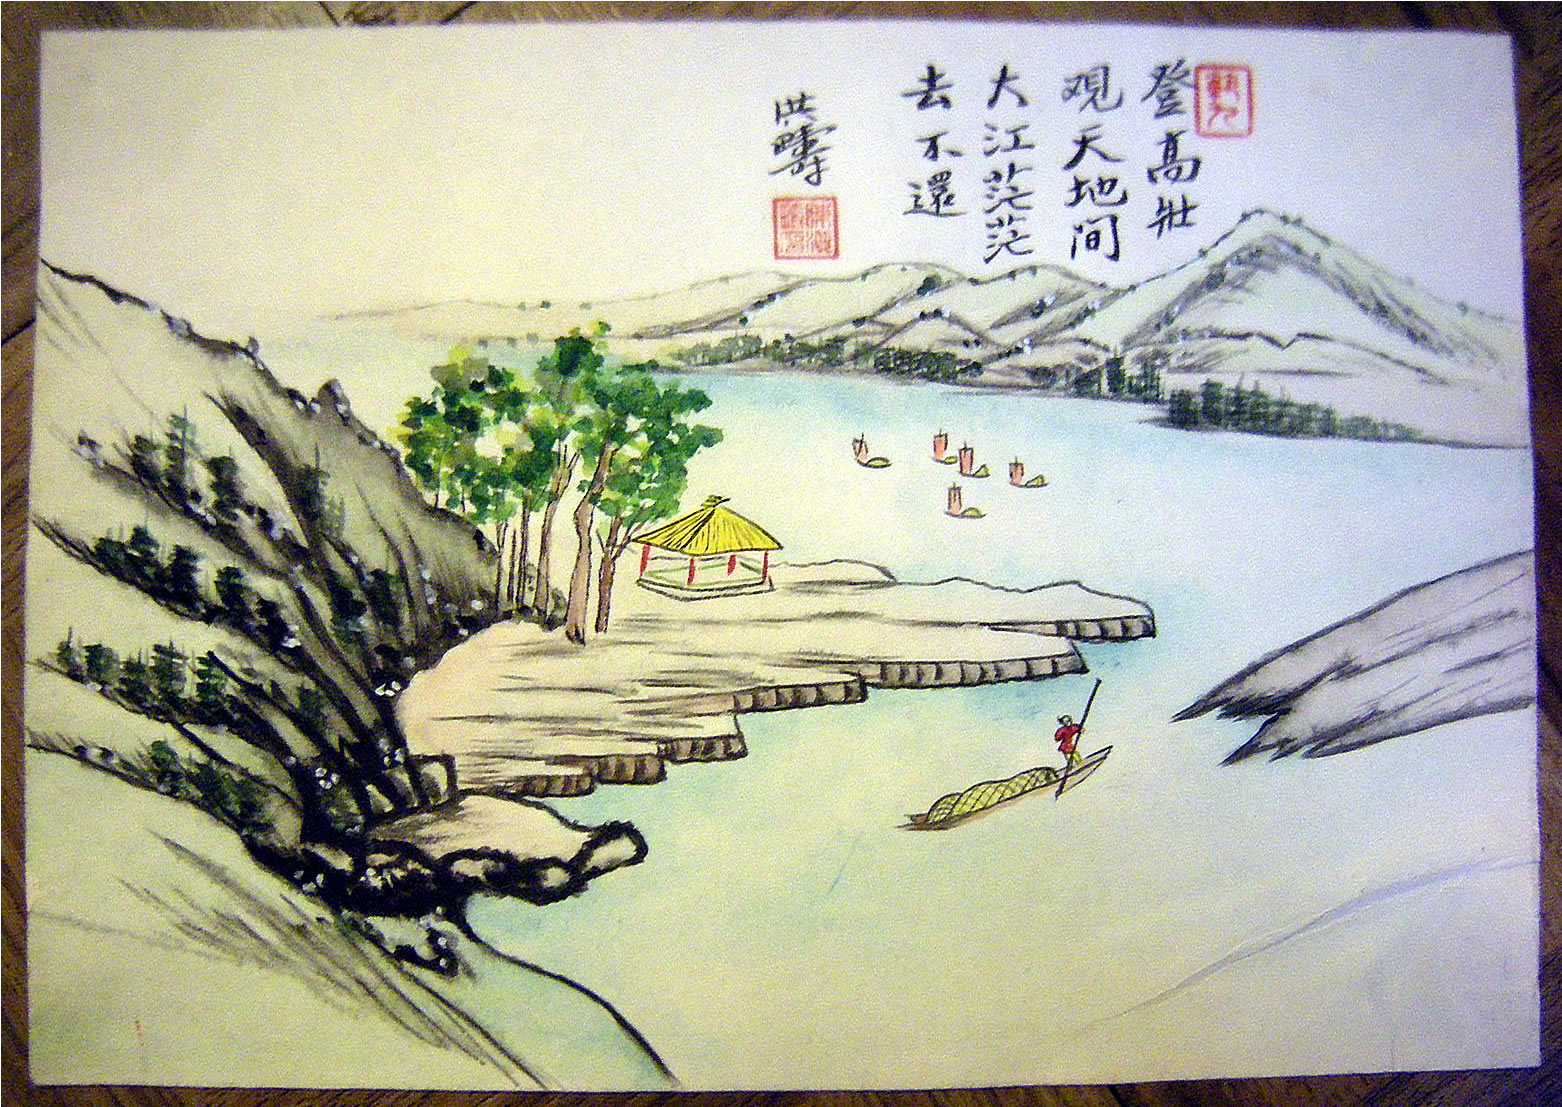 Original Chinese Shan Shui Landscape Painting by Chen Hongchou 陳 洪疇 山水